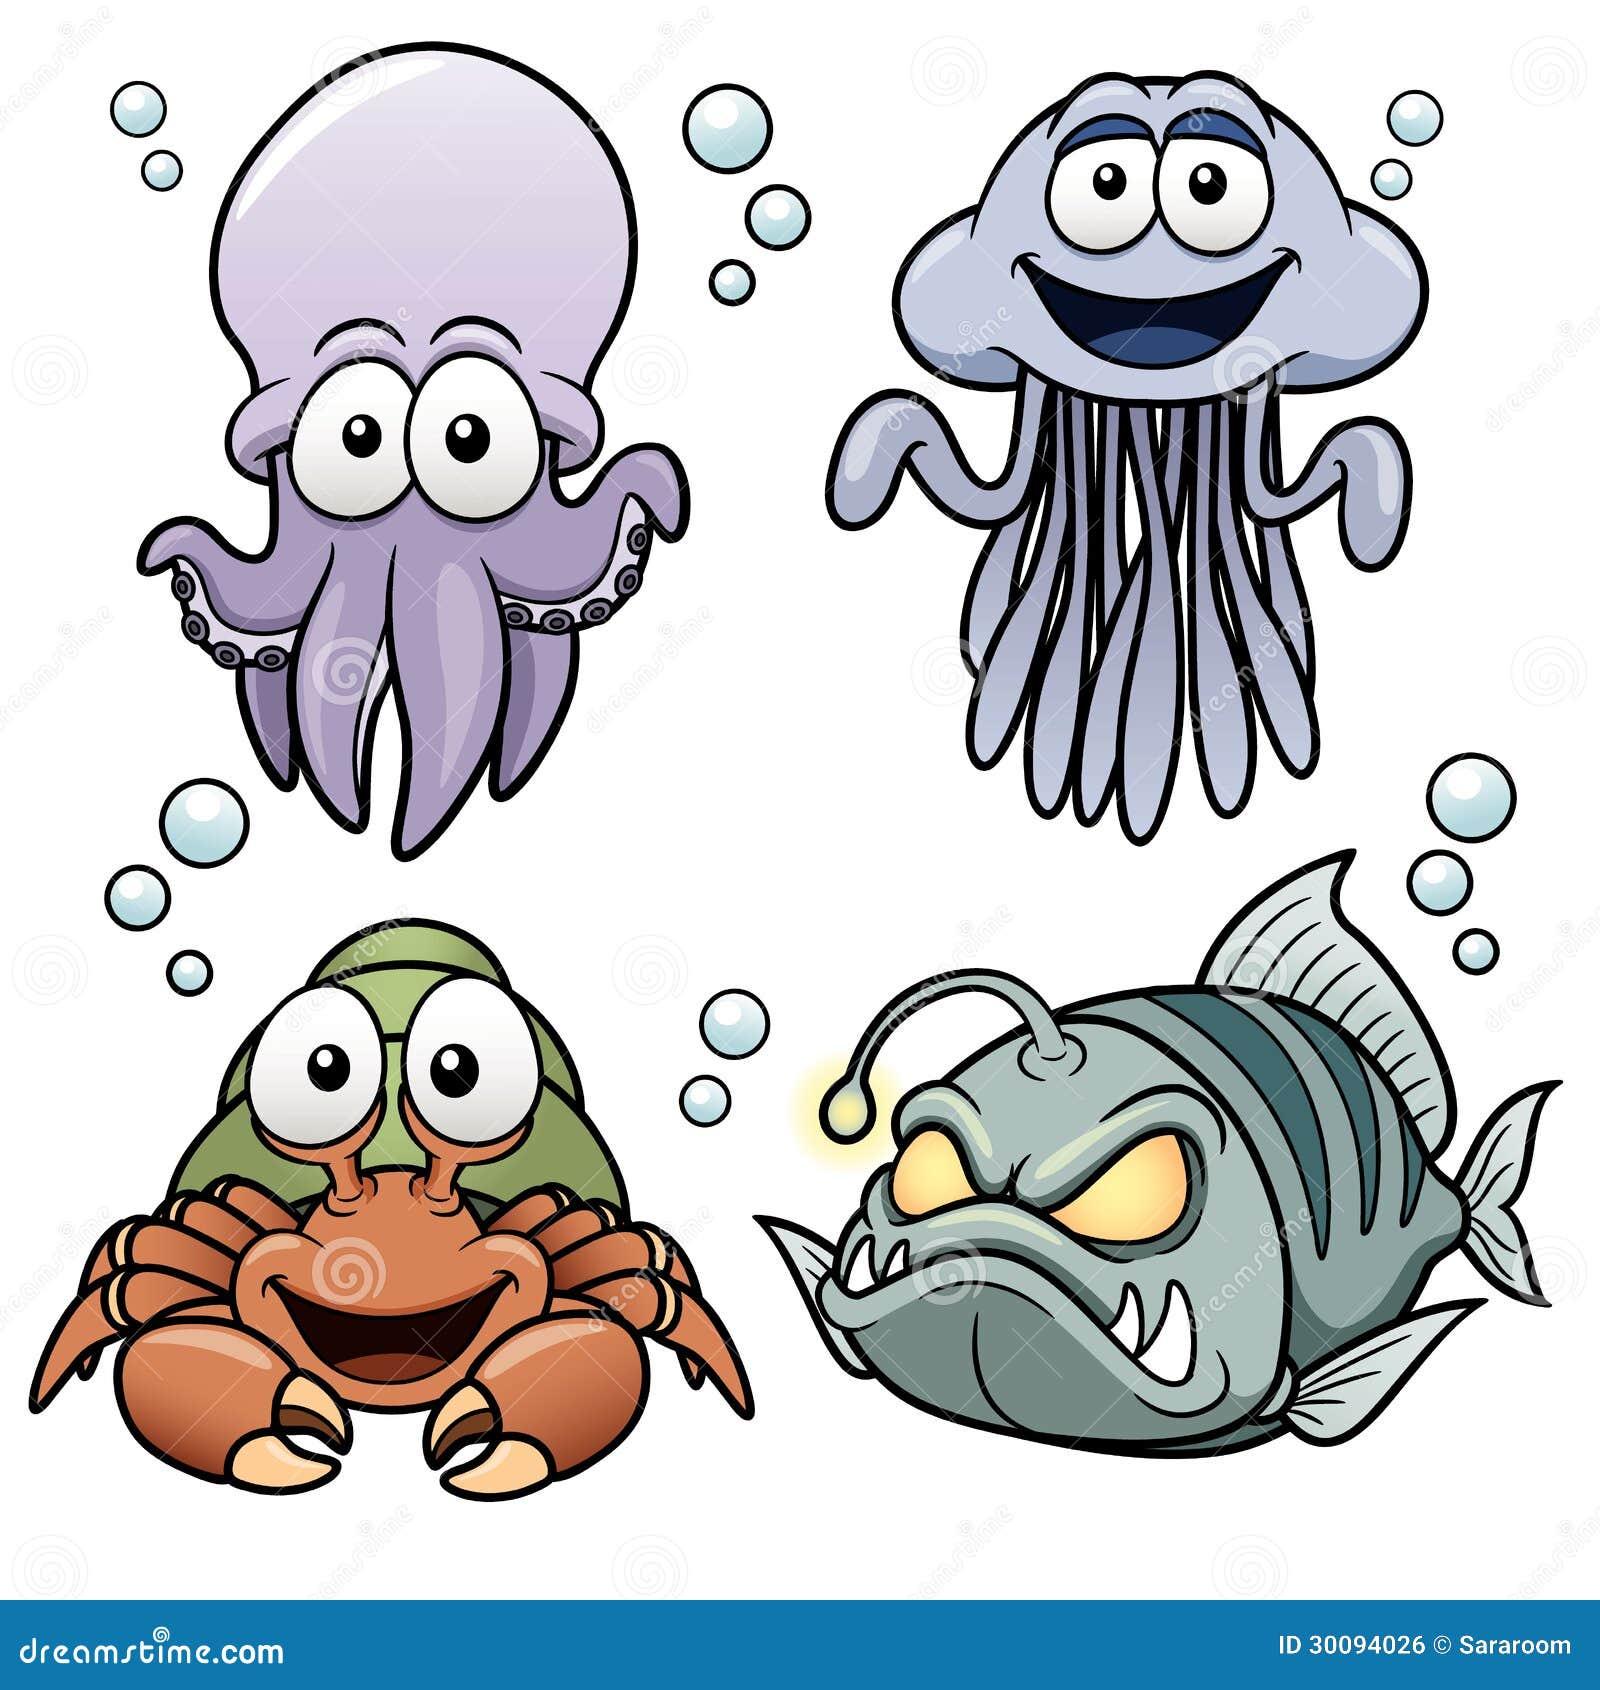 no系统及其在海洋动物病害防御中的研究进展  nooperatingsystem怎么图片